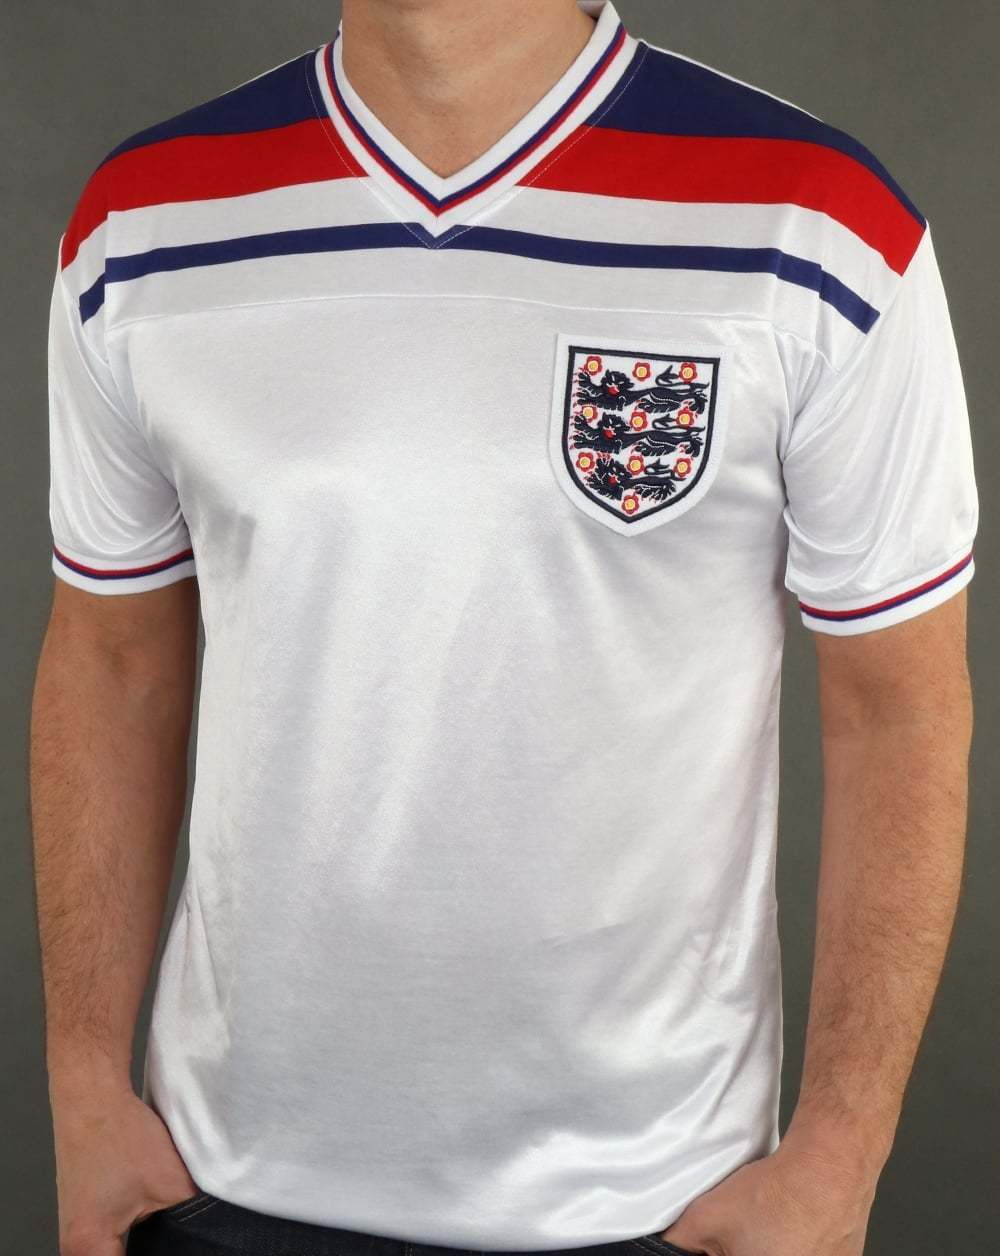 SCORE Draw Stile Retrò Retrò Retrò Inghilterra 1982 Football Shirt in Bianco-Replica World Cup 82 e51f42